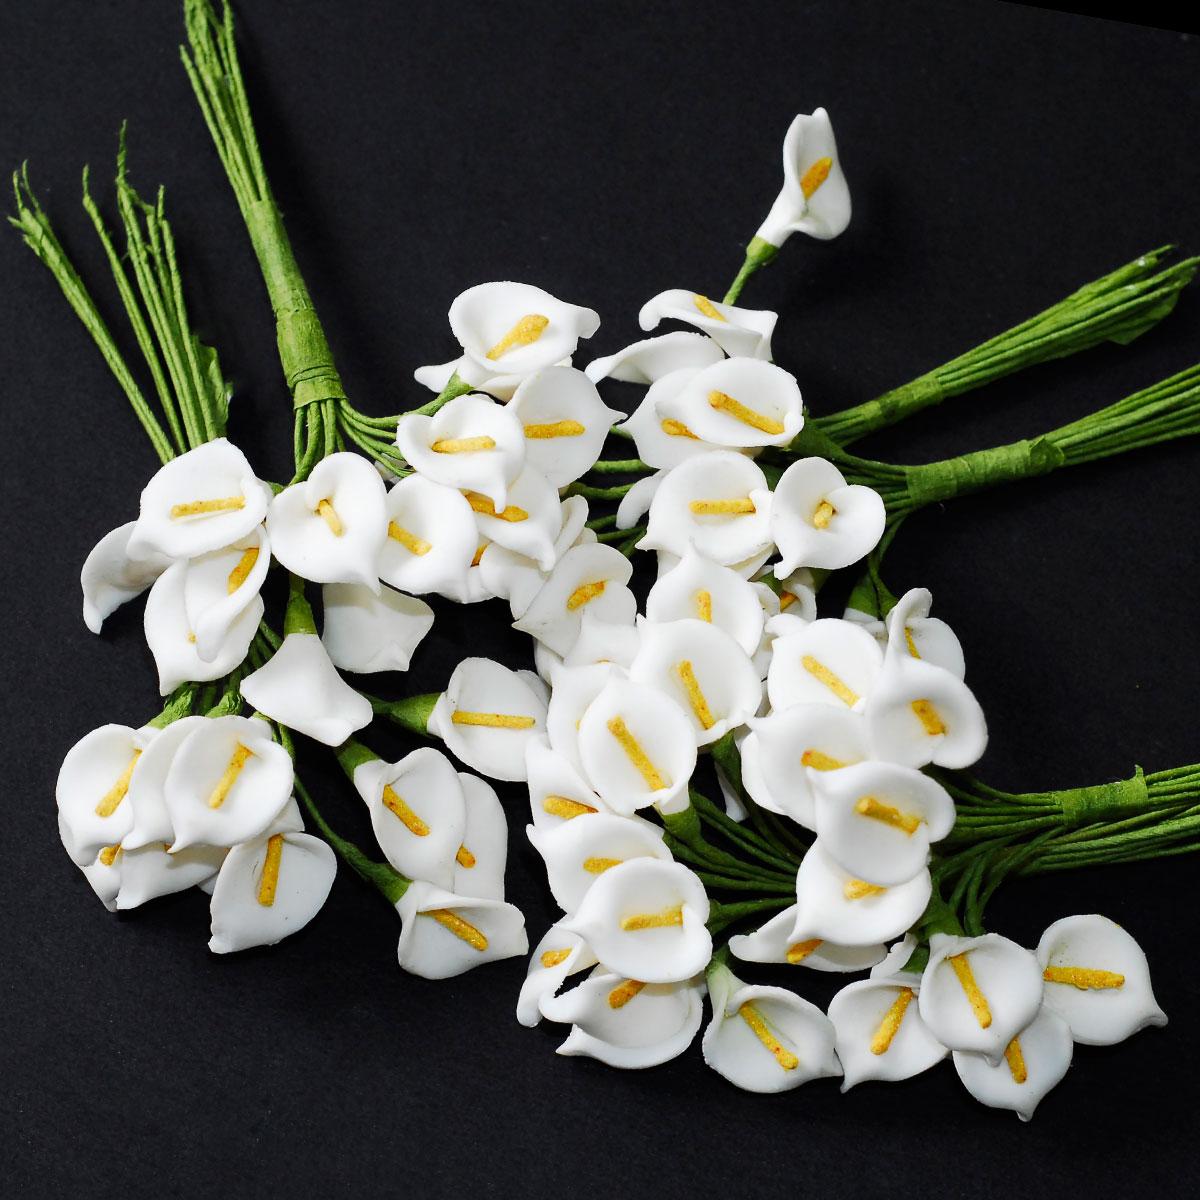 Mini Flower Calla Lily Bouquet Wedding Baby Shower Birthday Party Decoration